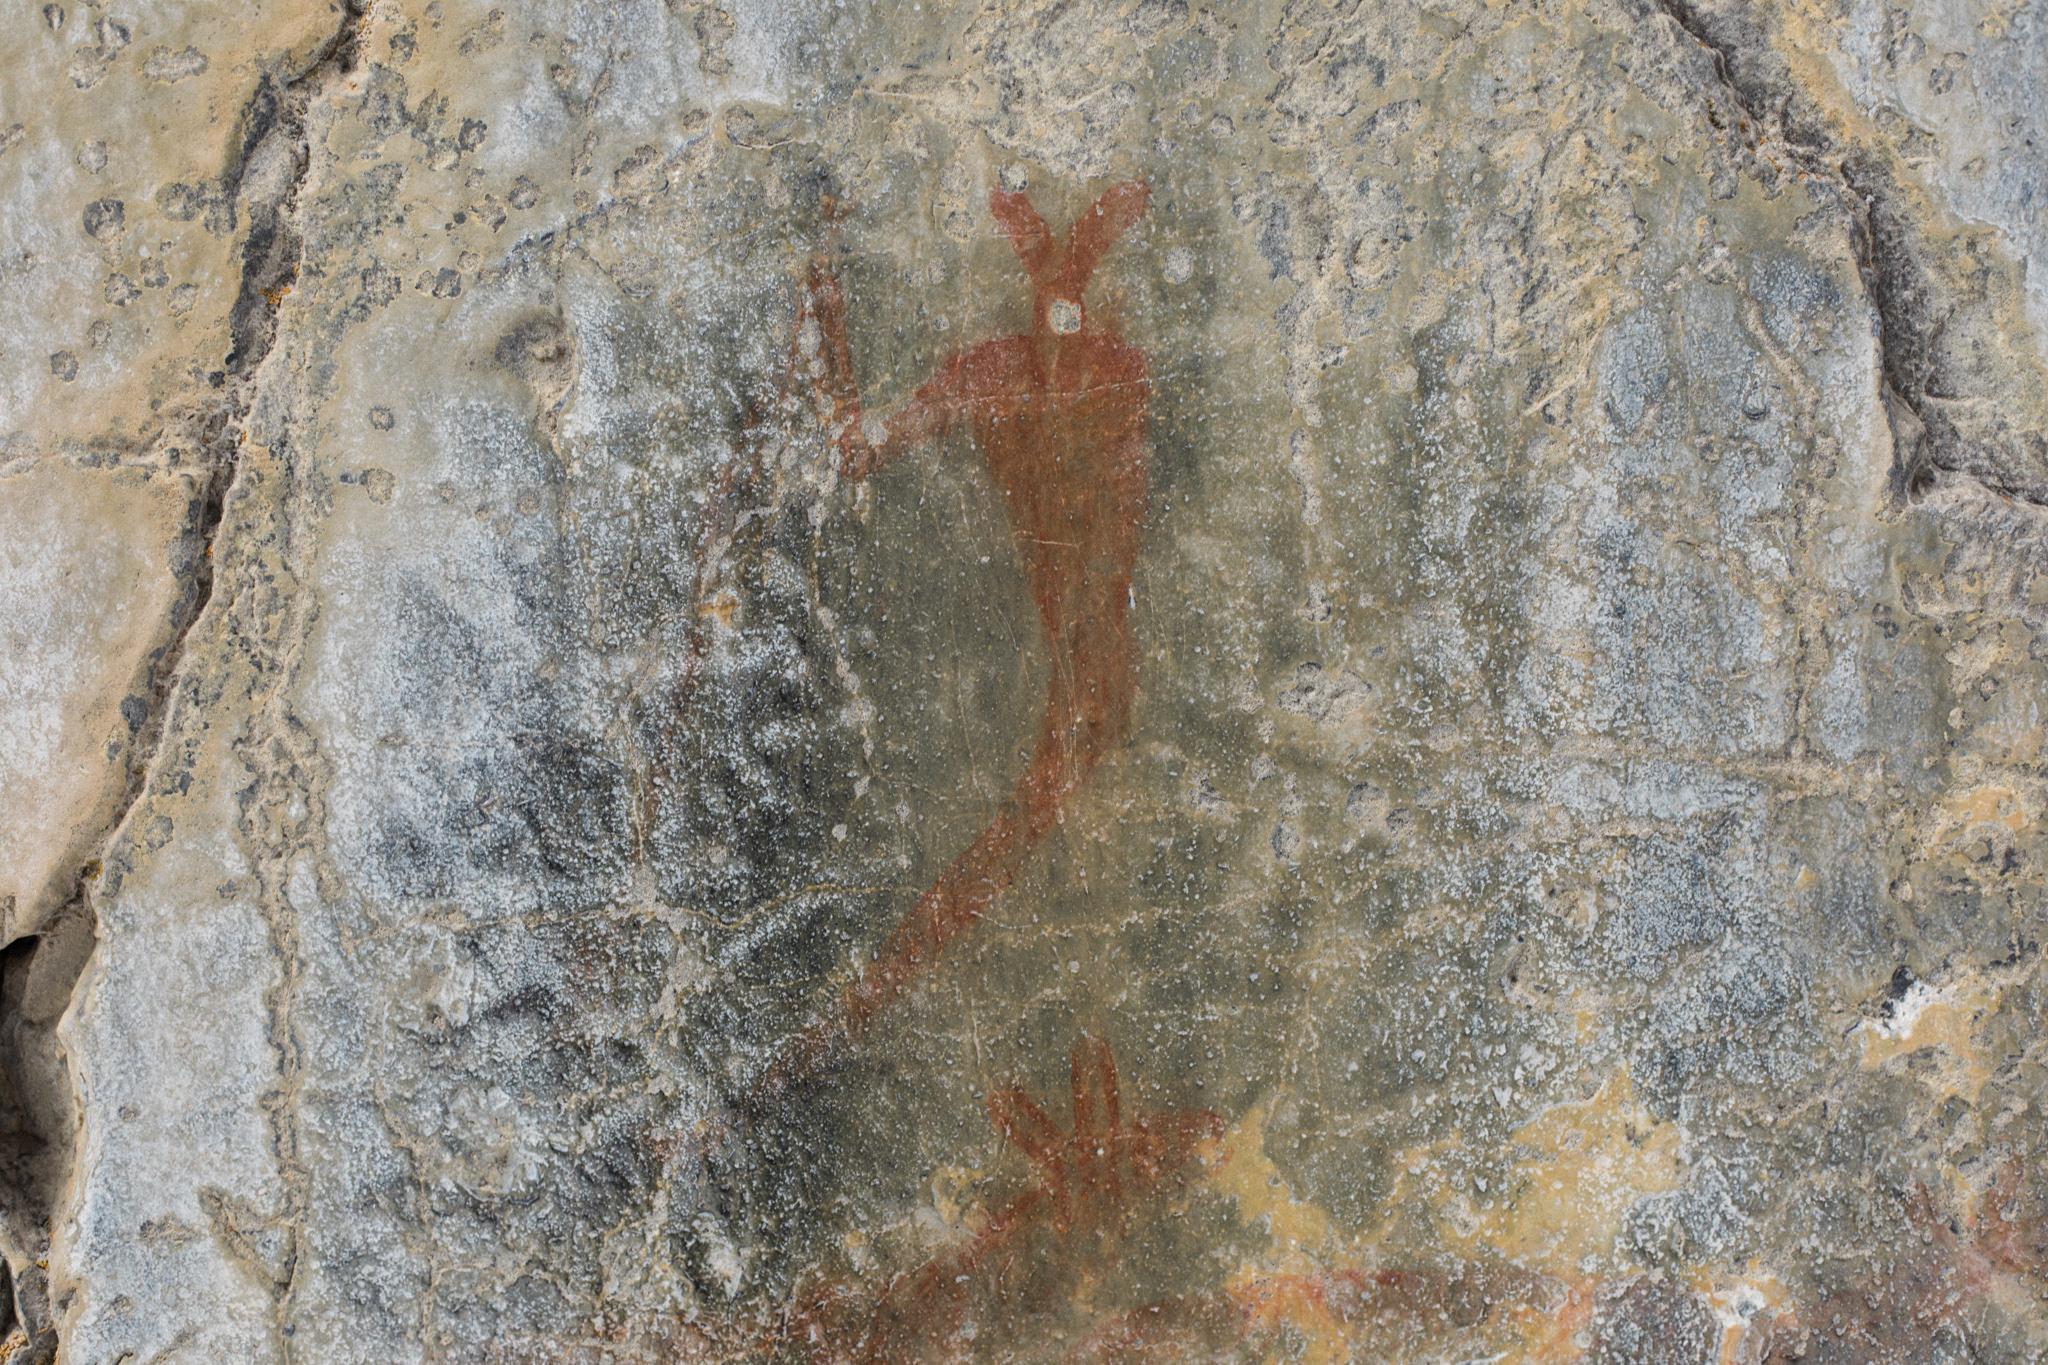 grotto-34.jpg